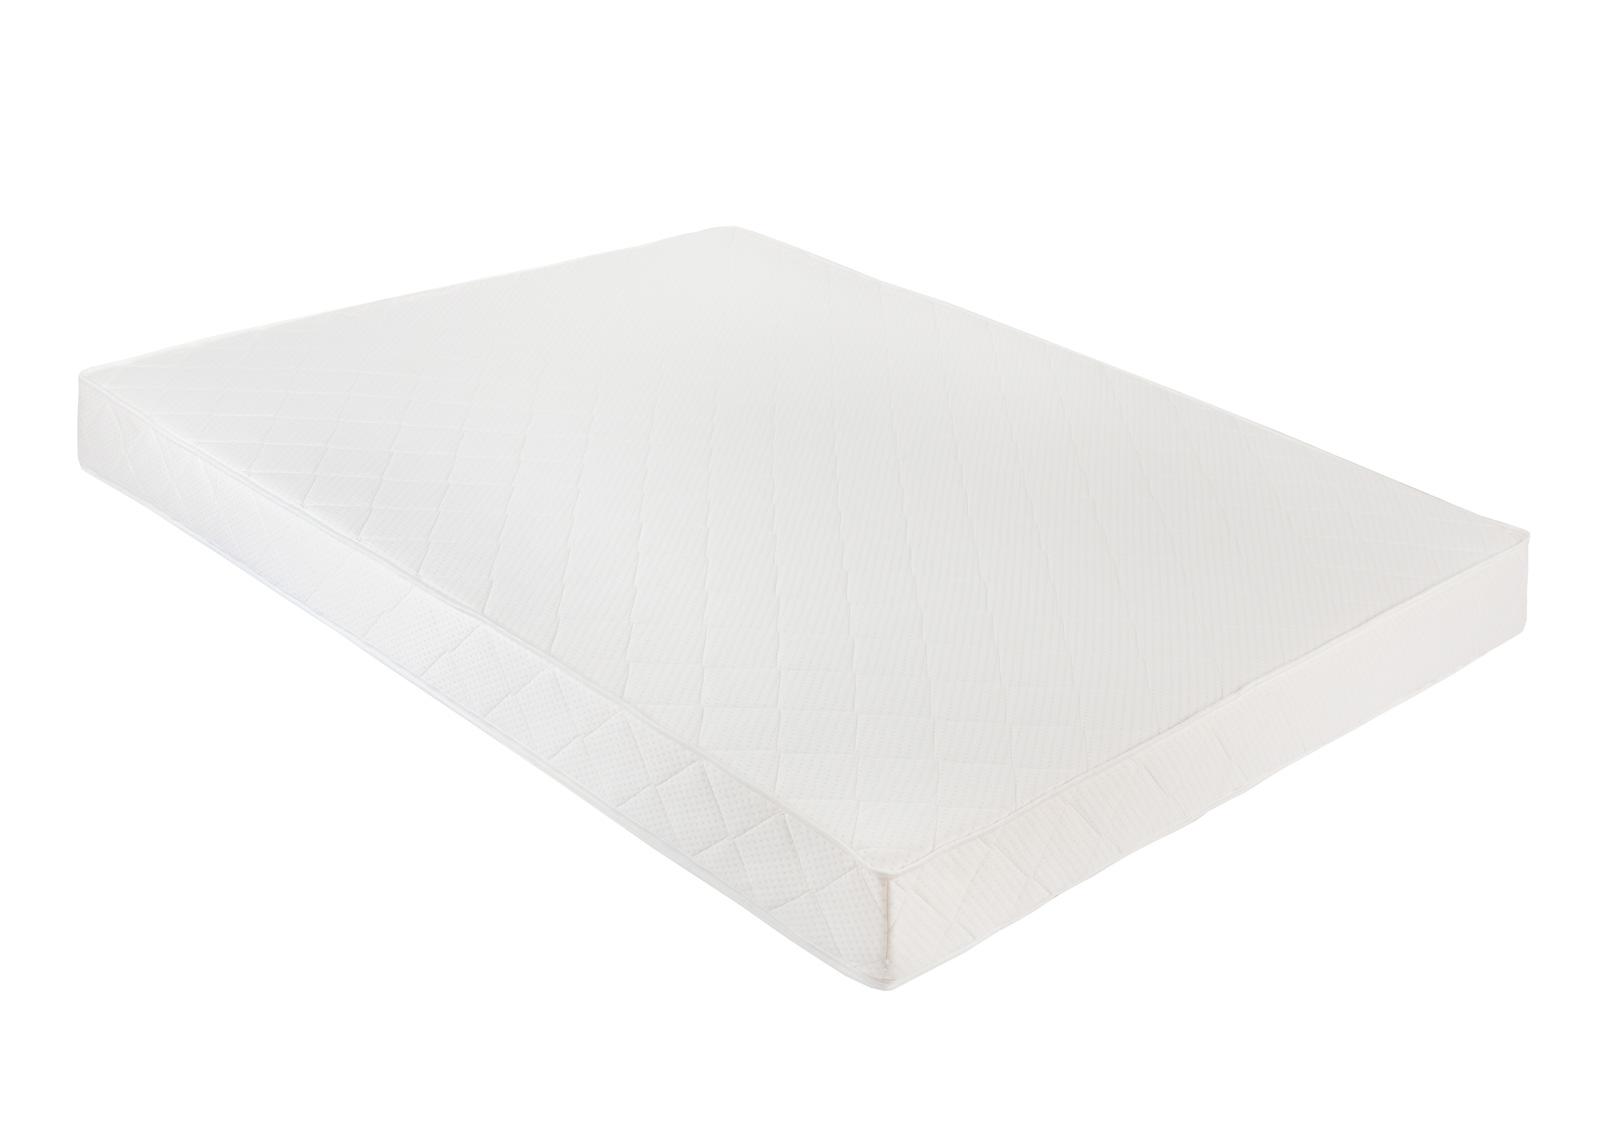 Joustinpatja Pocket 180x200 cm